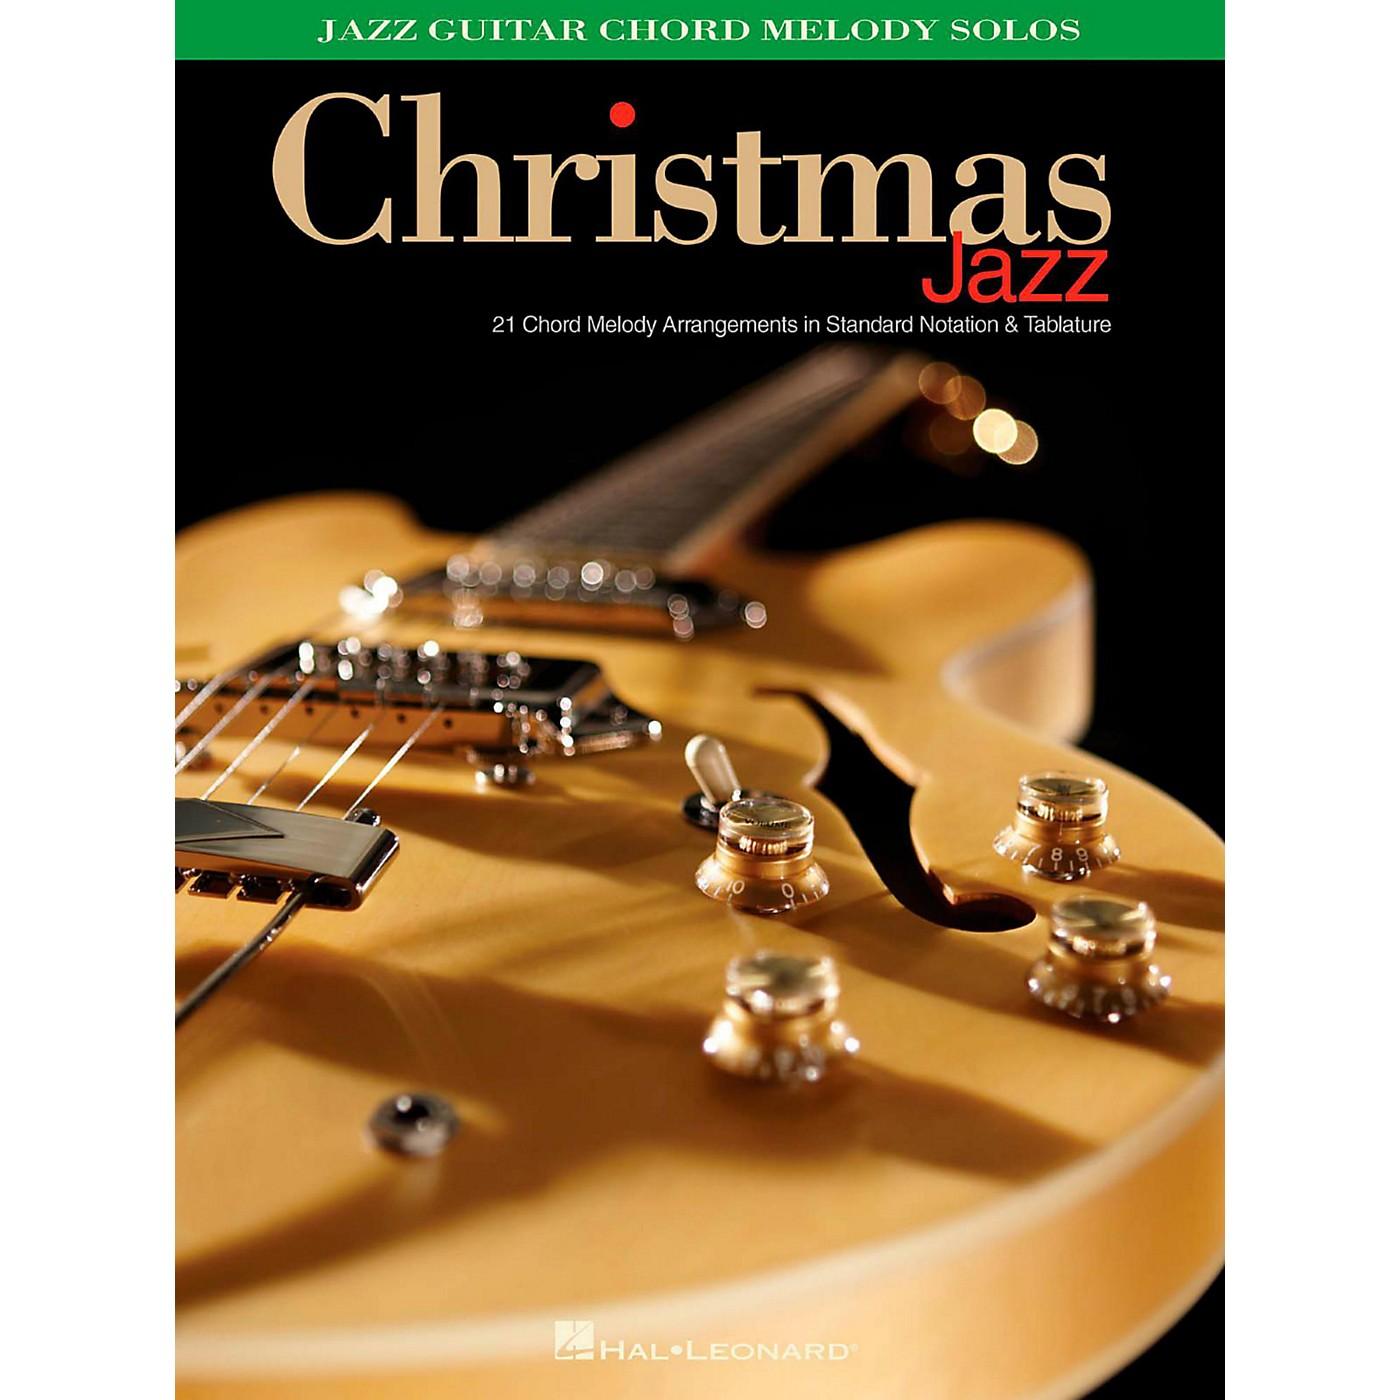 Hal Leonard Christmas Jazz - Jazz Guitar Chord Melody Solos thumbnail